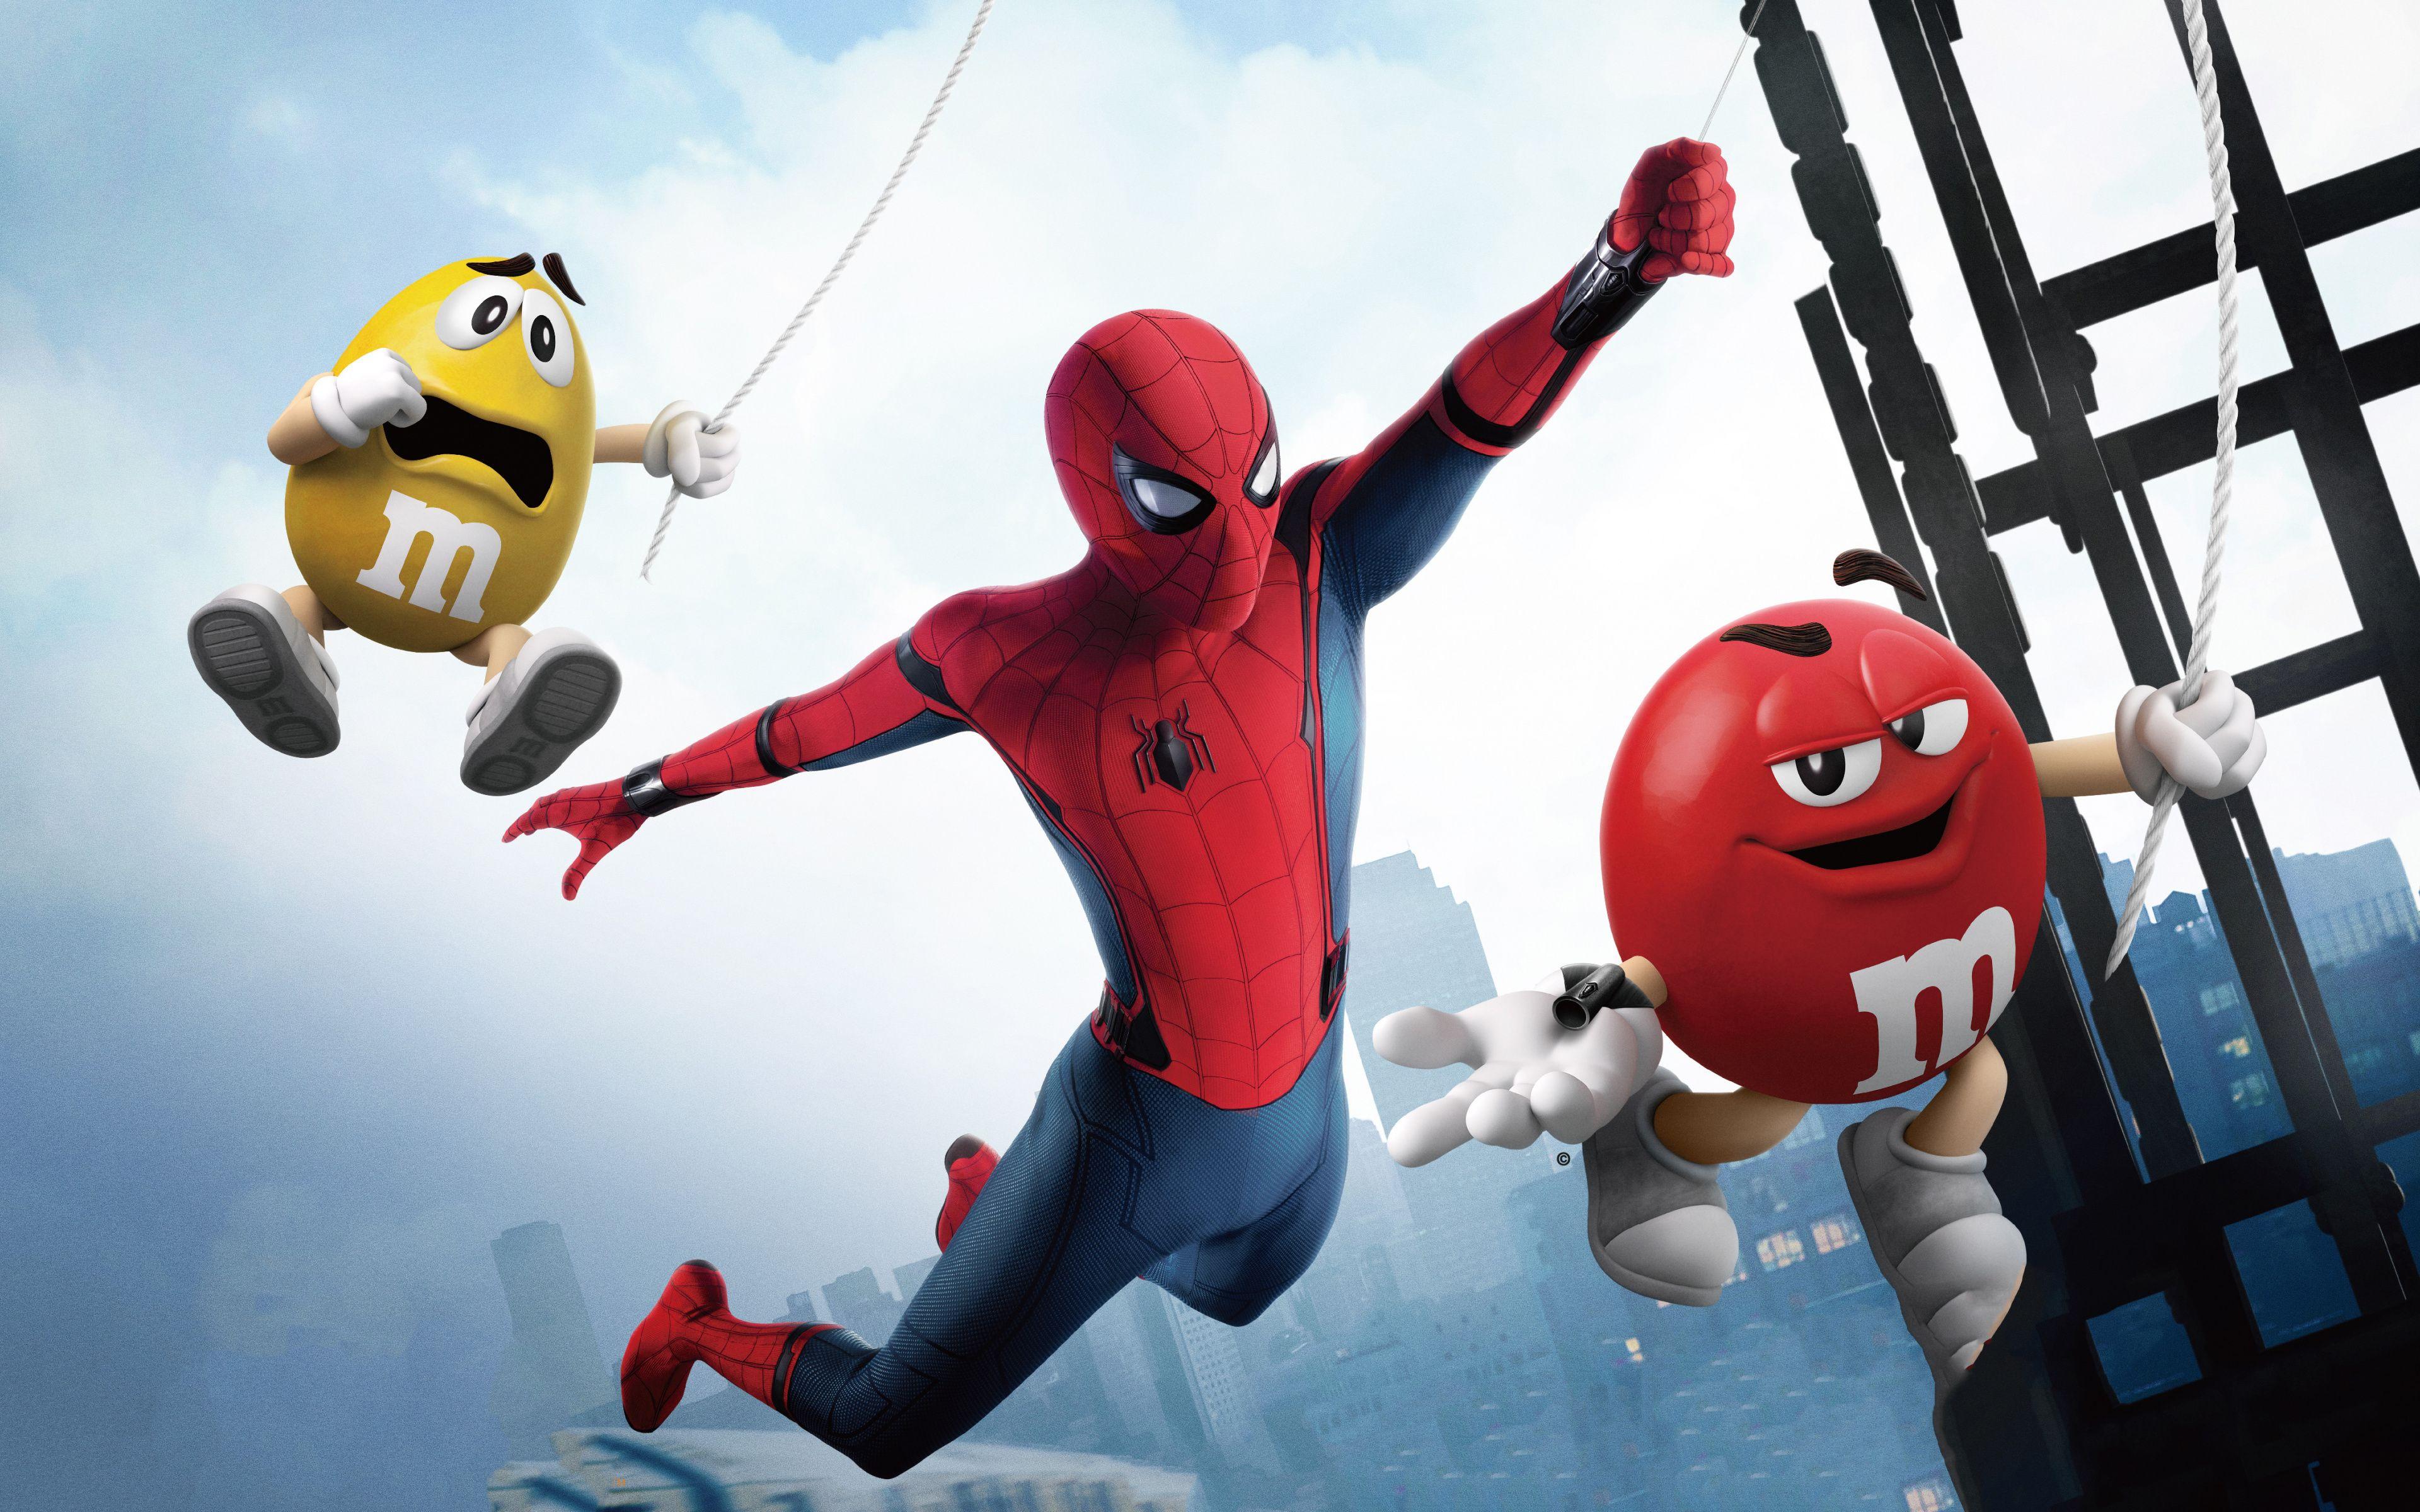 Downaload SpiderMan Candyman wallpaper